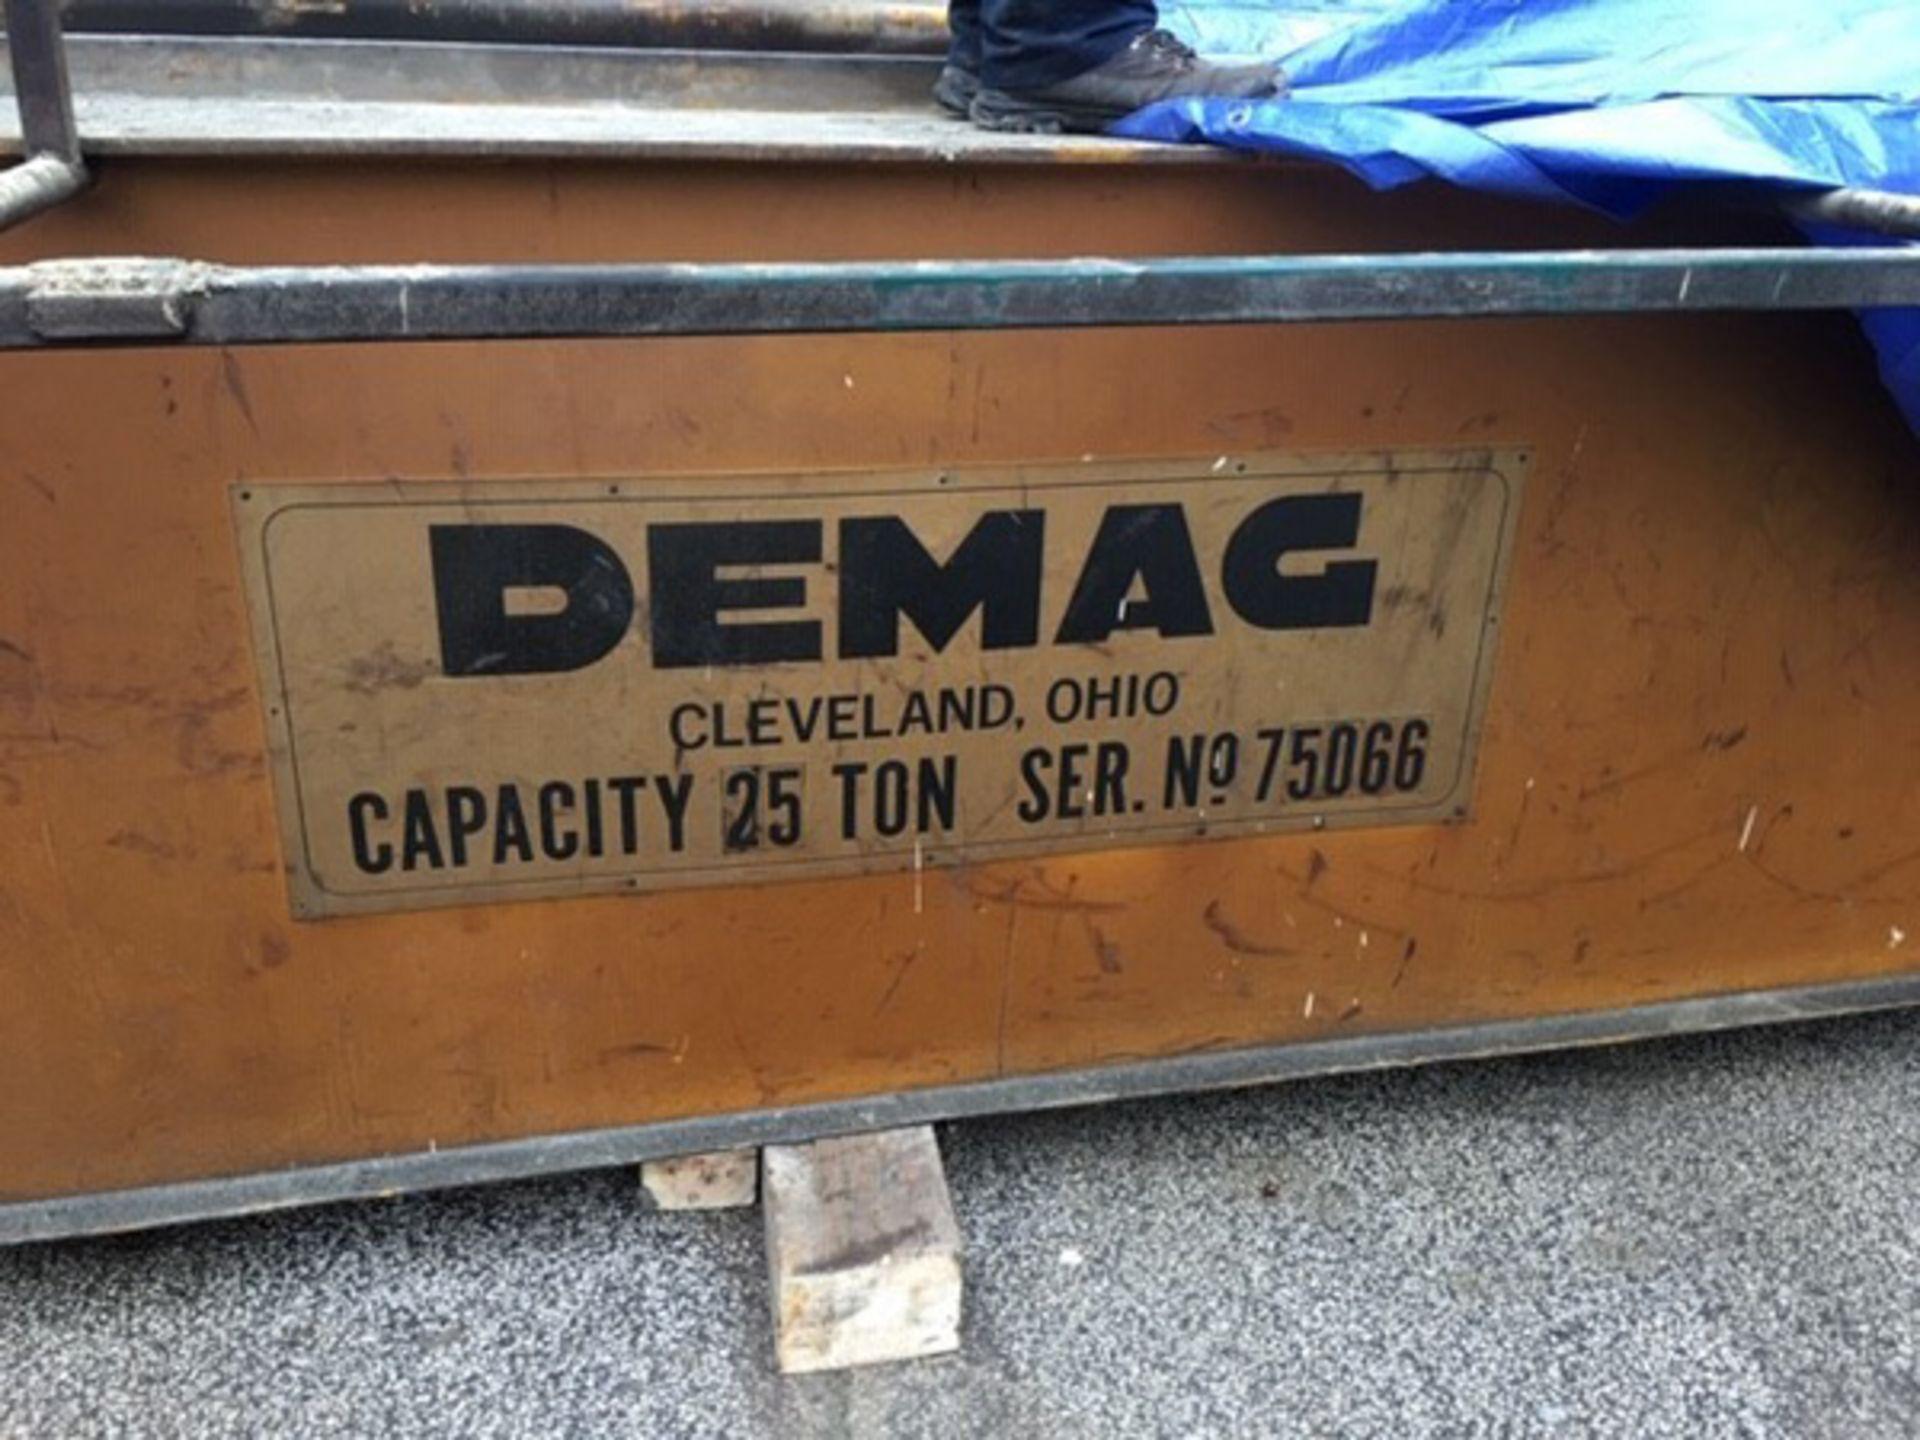 Demag Top Riding Double Girder Bridge Crane | 25-Ton x 50', Mdl: N/A, S/N: 75066 - 8398P - Image 10 of 10